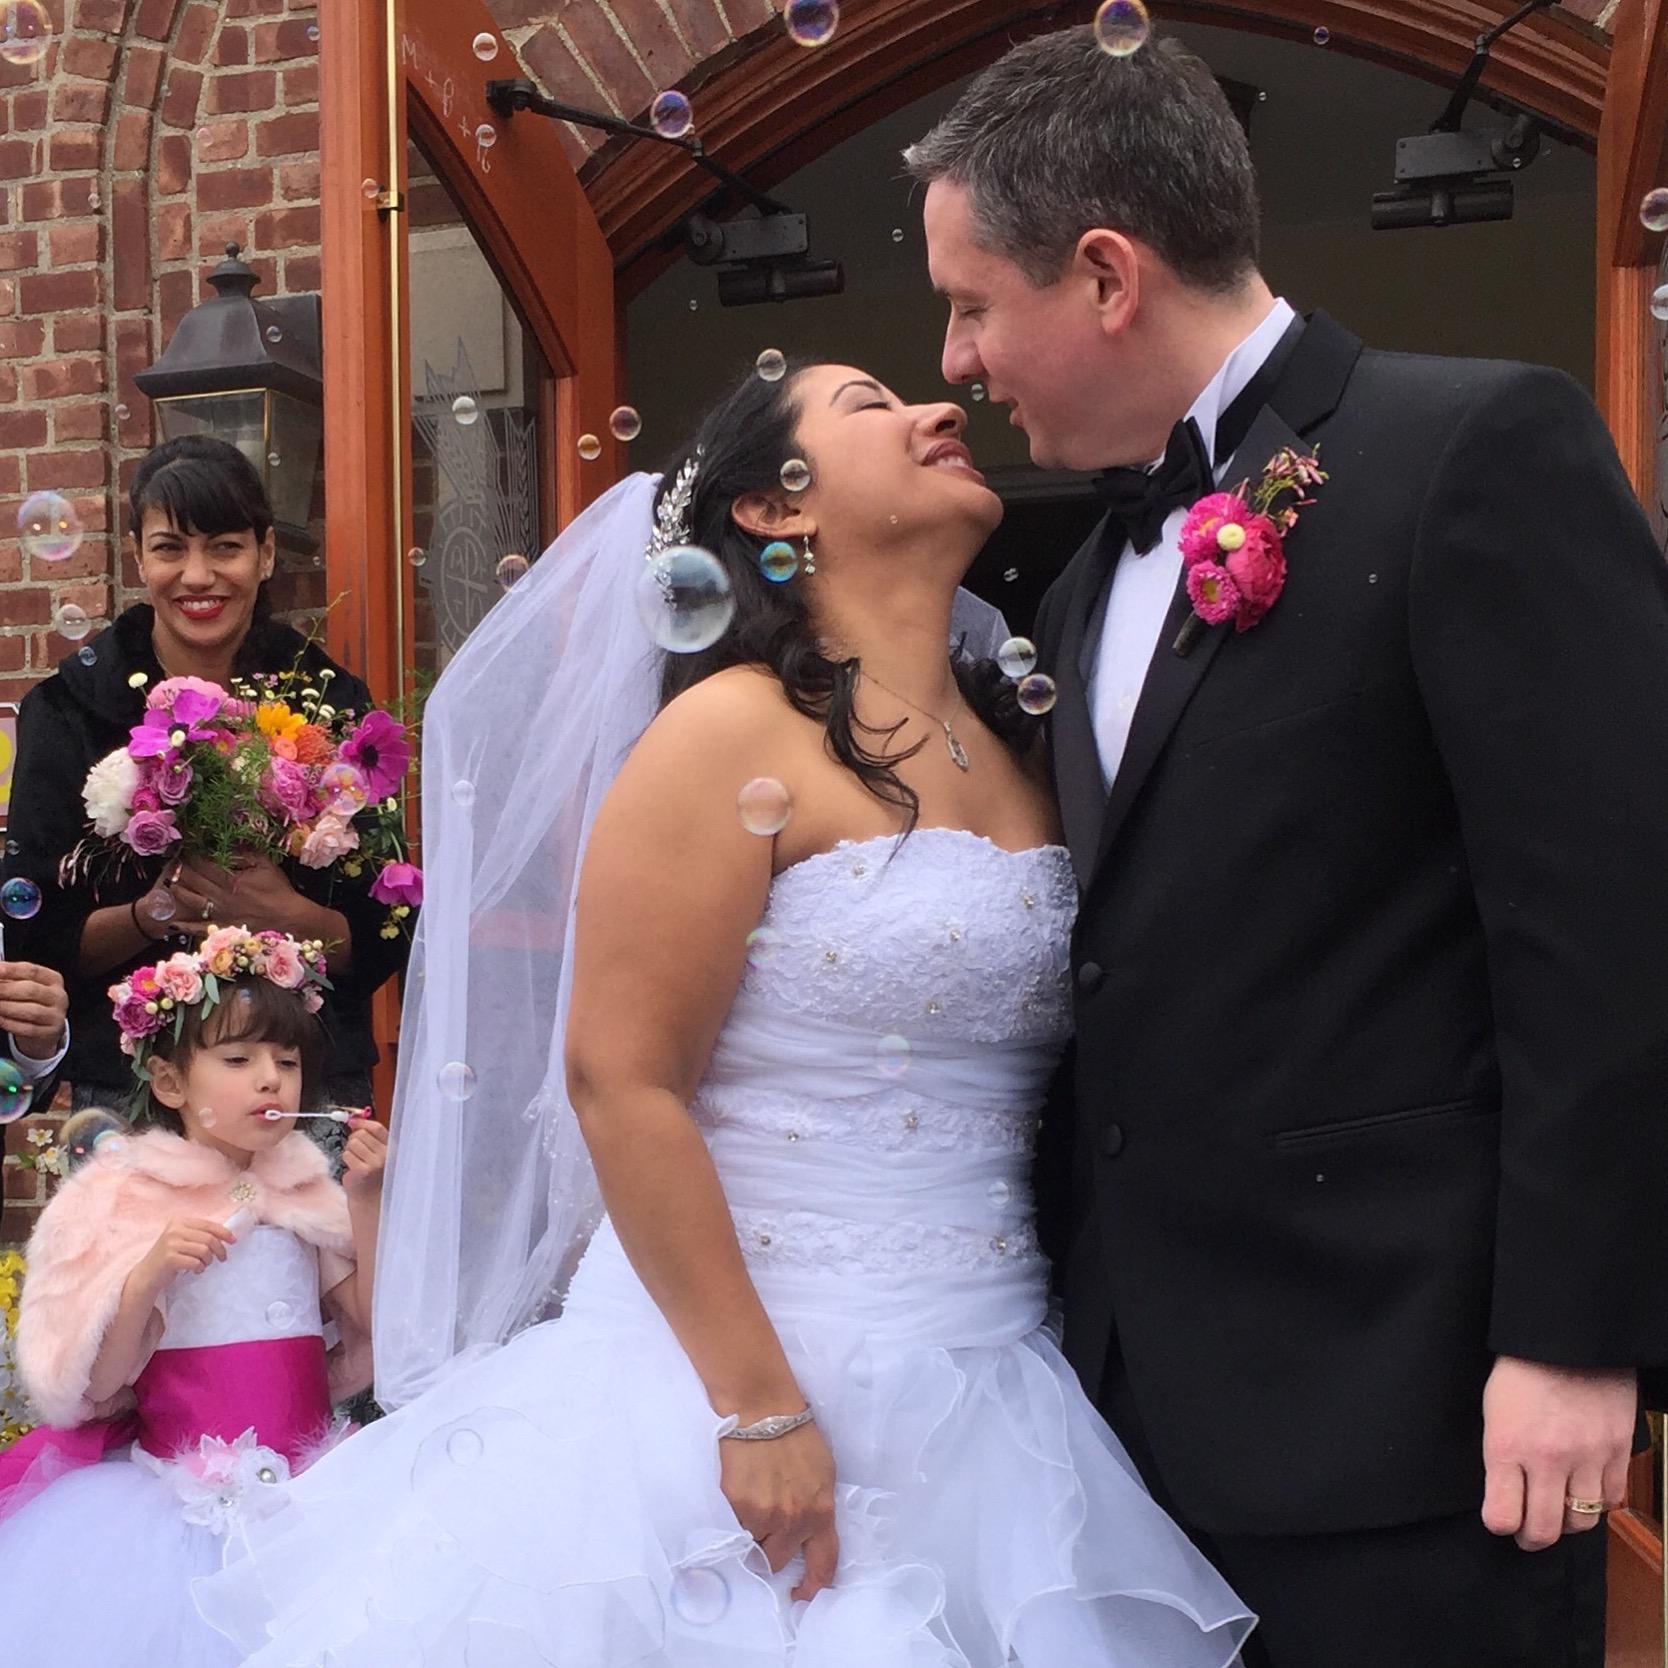 Happy Wedding Day, Liz. Happy True Love.